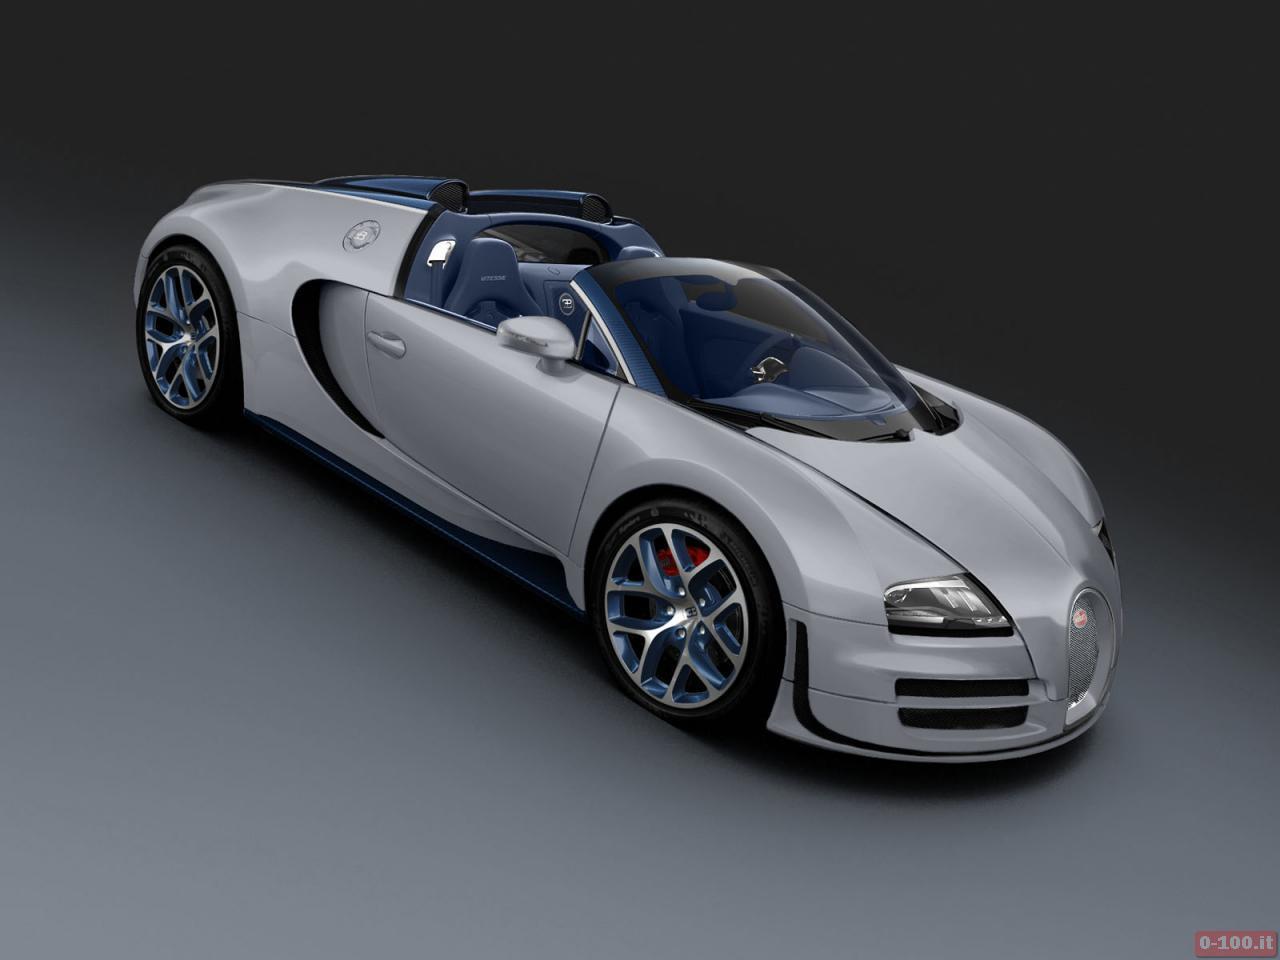 bugatti-veyron-16-4-grand-sport-vitesse-rafale_0-100_1